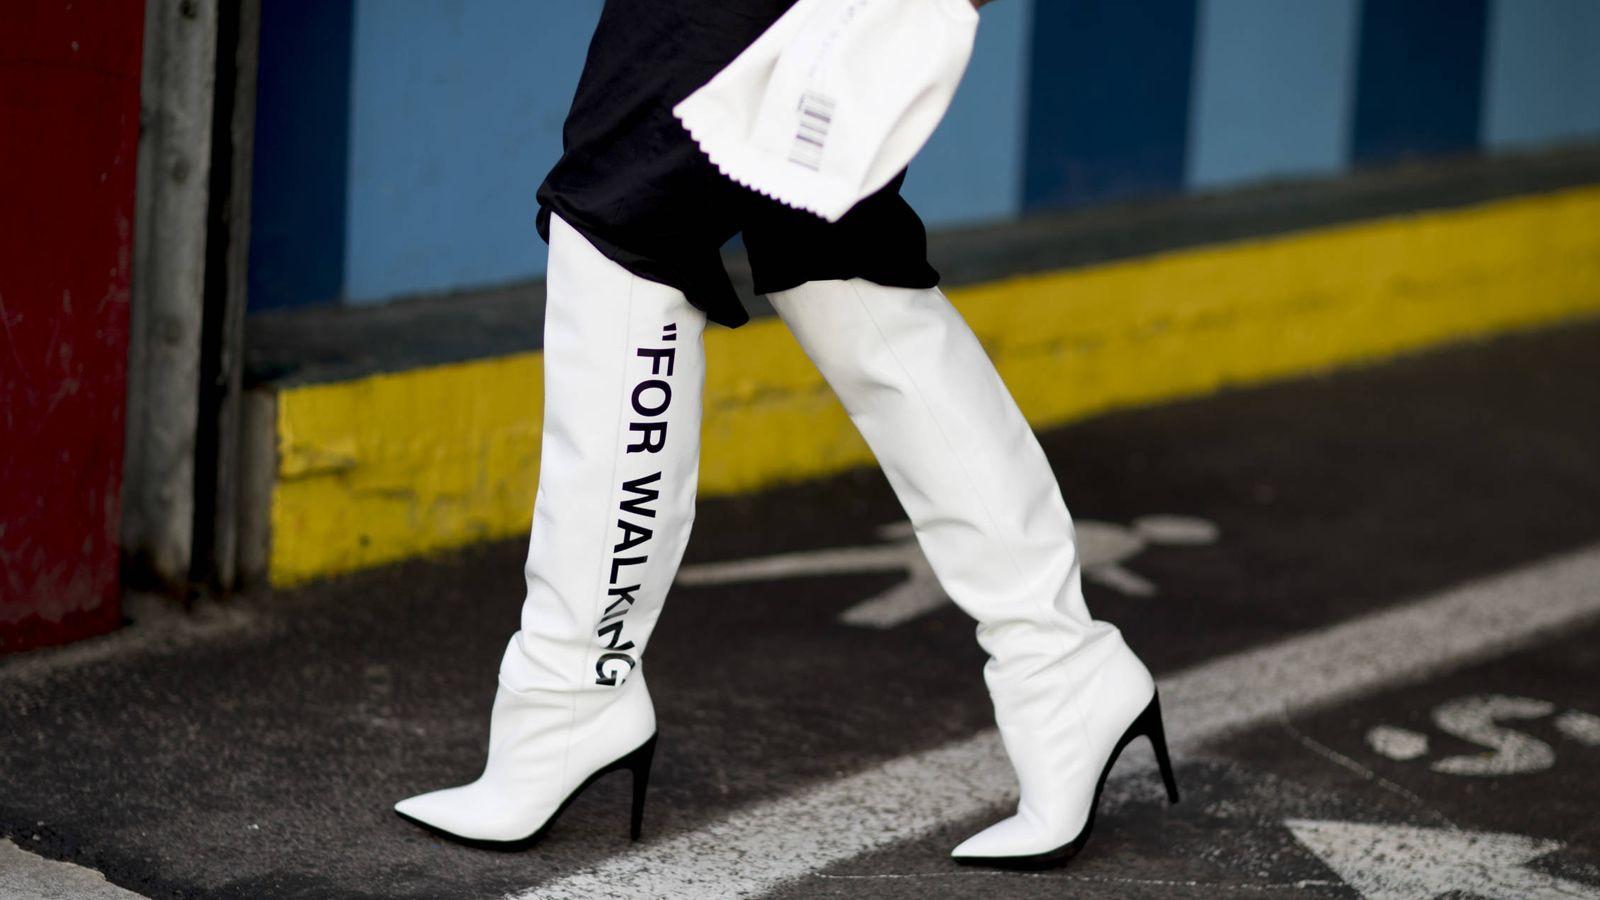 como-llevar-los-zapatos -blancos-tendencias-que-antes-dudabas-seguir.jpg mtime 1538985885 e675200e381c